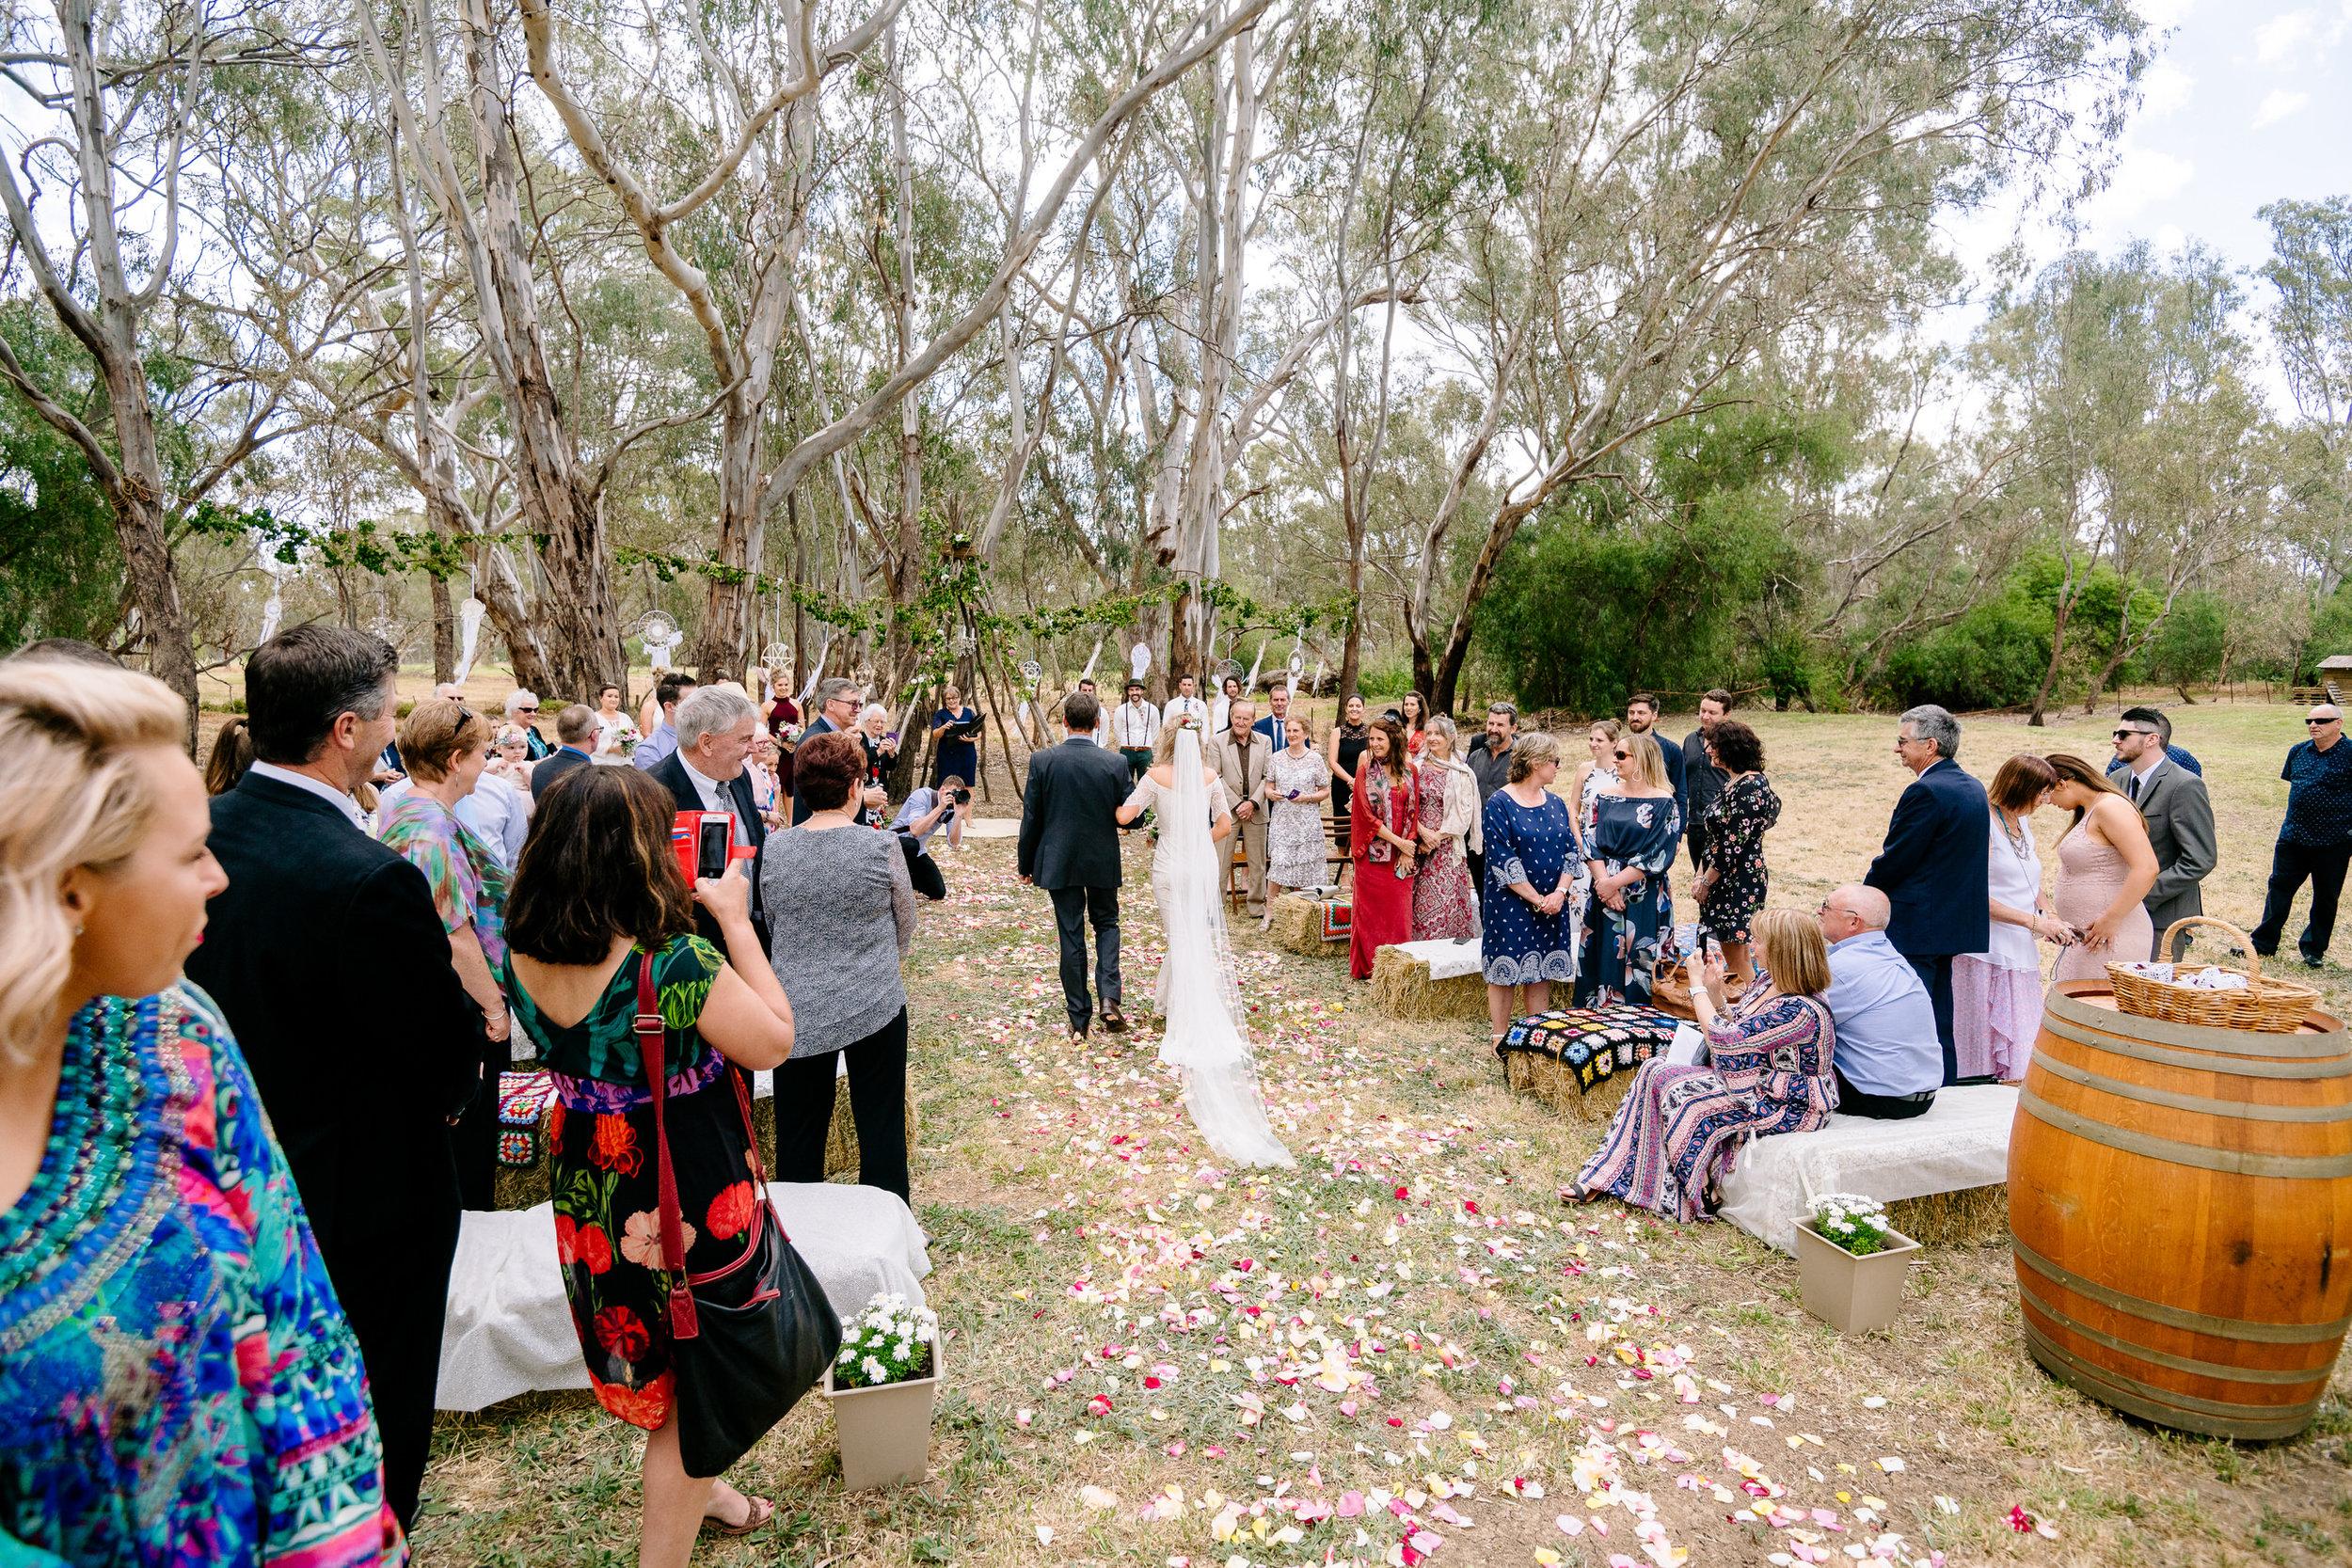 Justin_And_Jim_Photography_Backyard_Wedding168.JPG